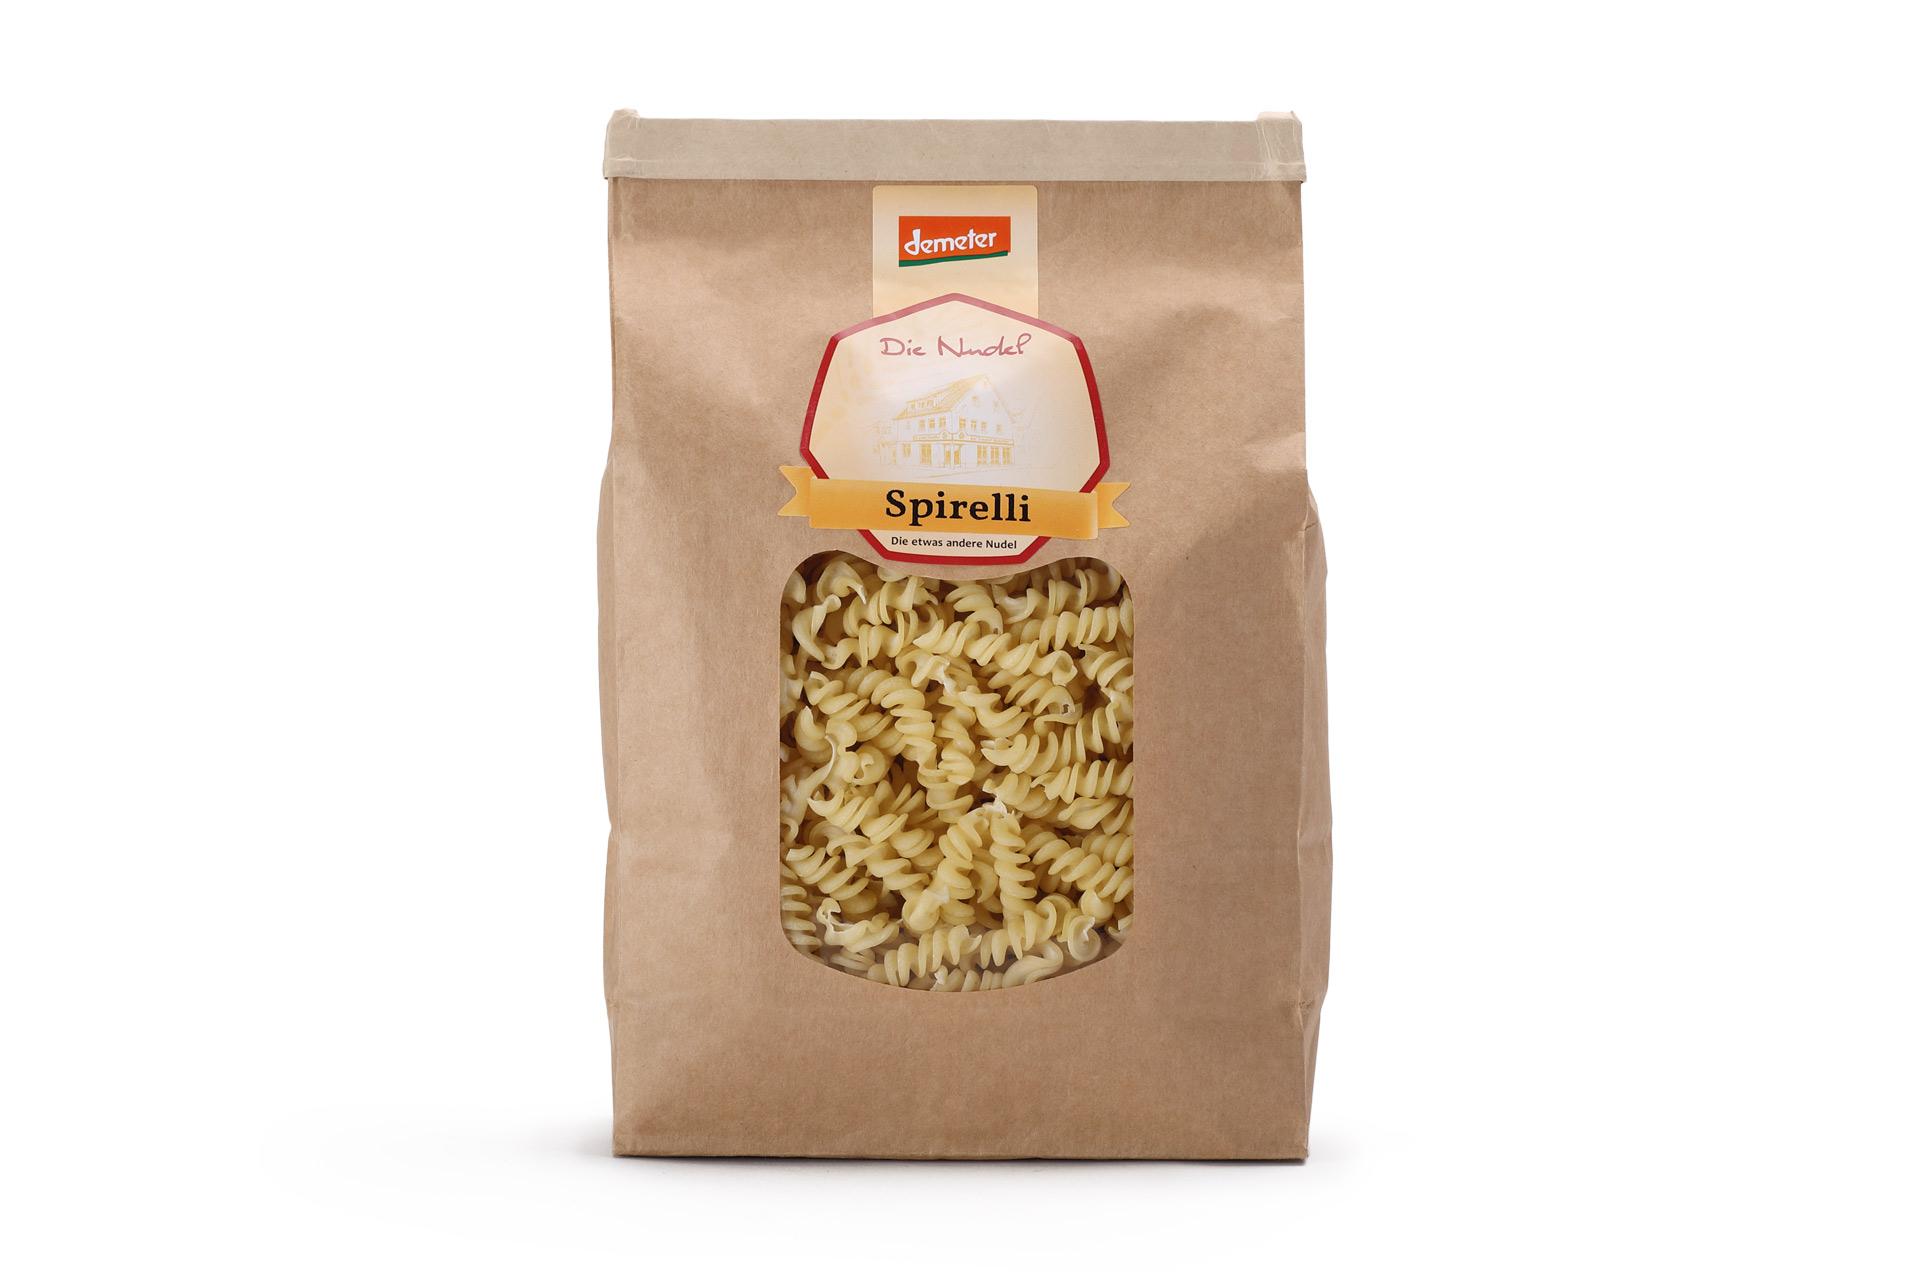 Spirelli-500-Hartweizengriess-Bio-Verpackung-kgs